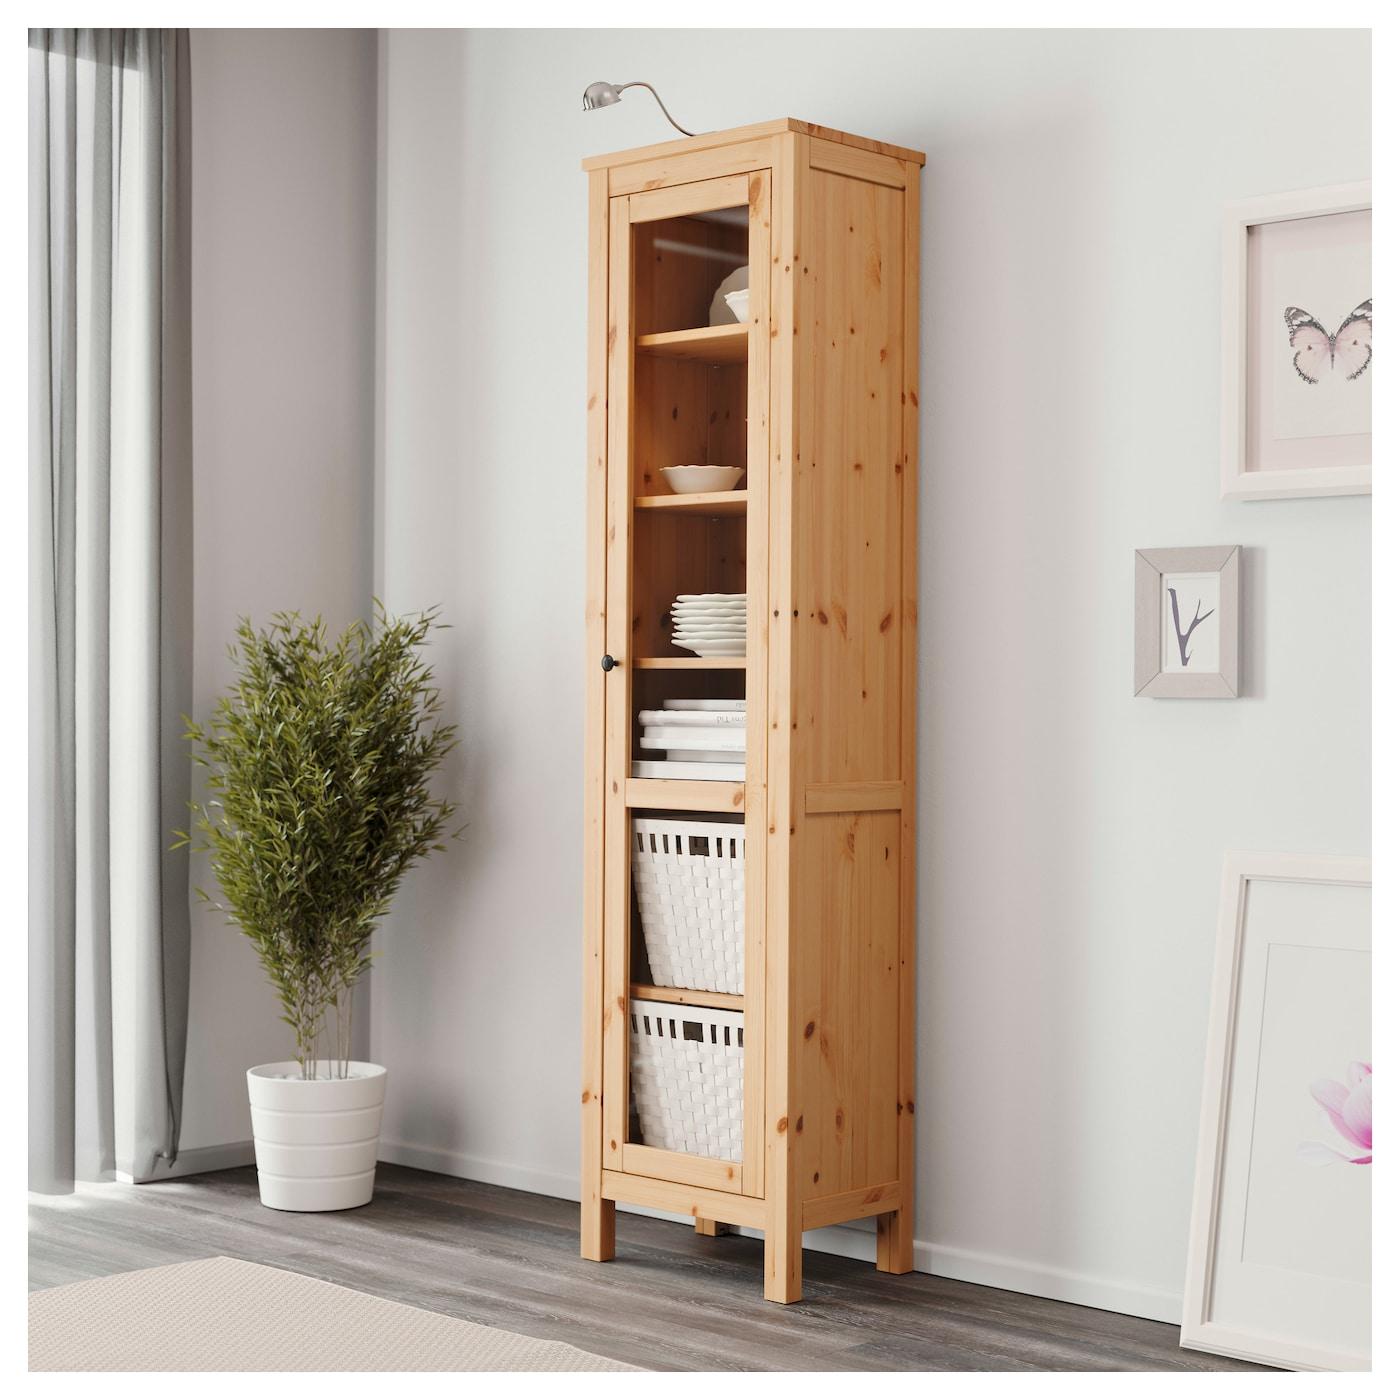 Hemnes Tv Unit Light Brown : IKEA HEMNES glassdoor cabinet Solid wood has a natural feel 1 fixed